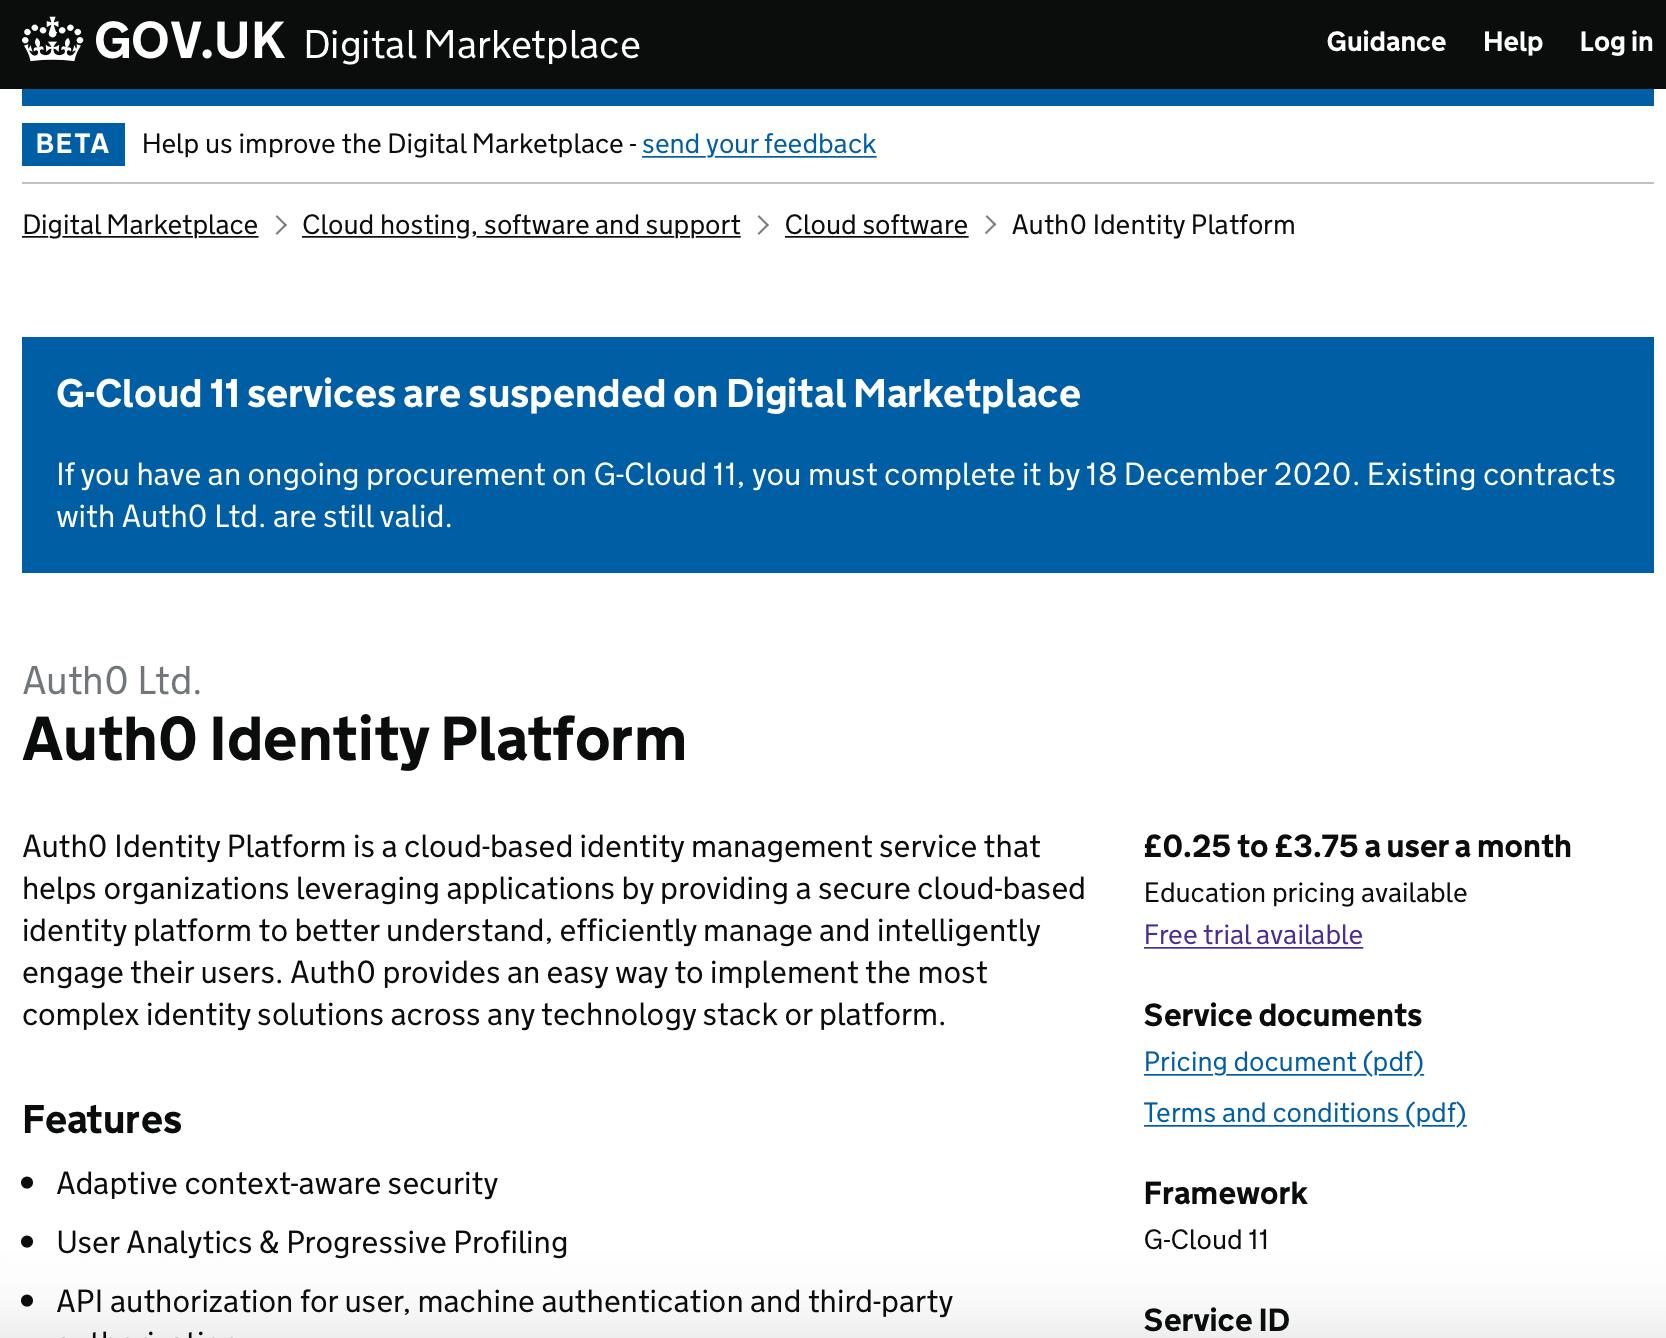 Auth0 Identity Platform